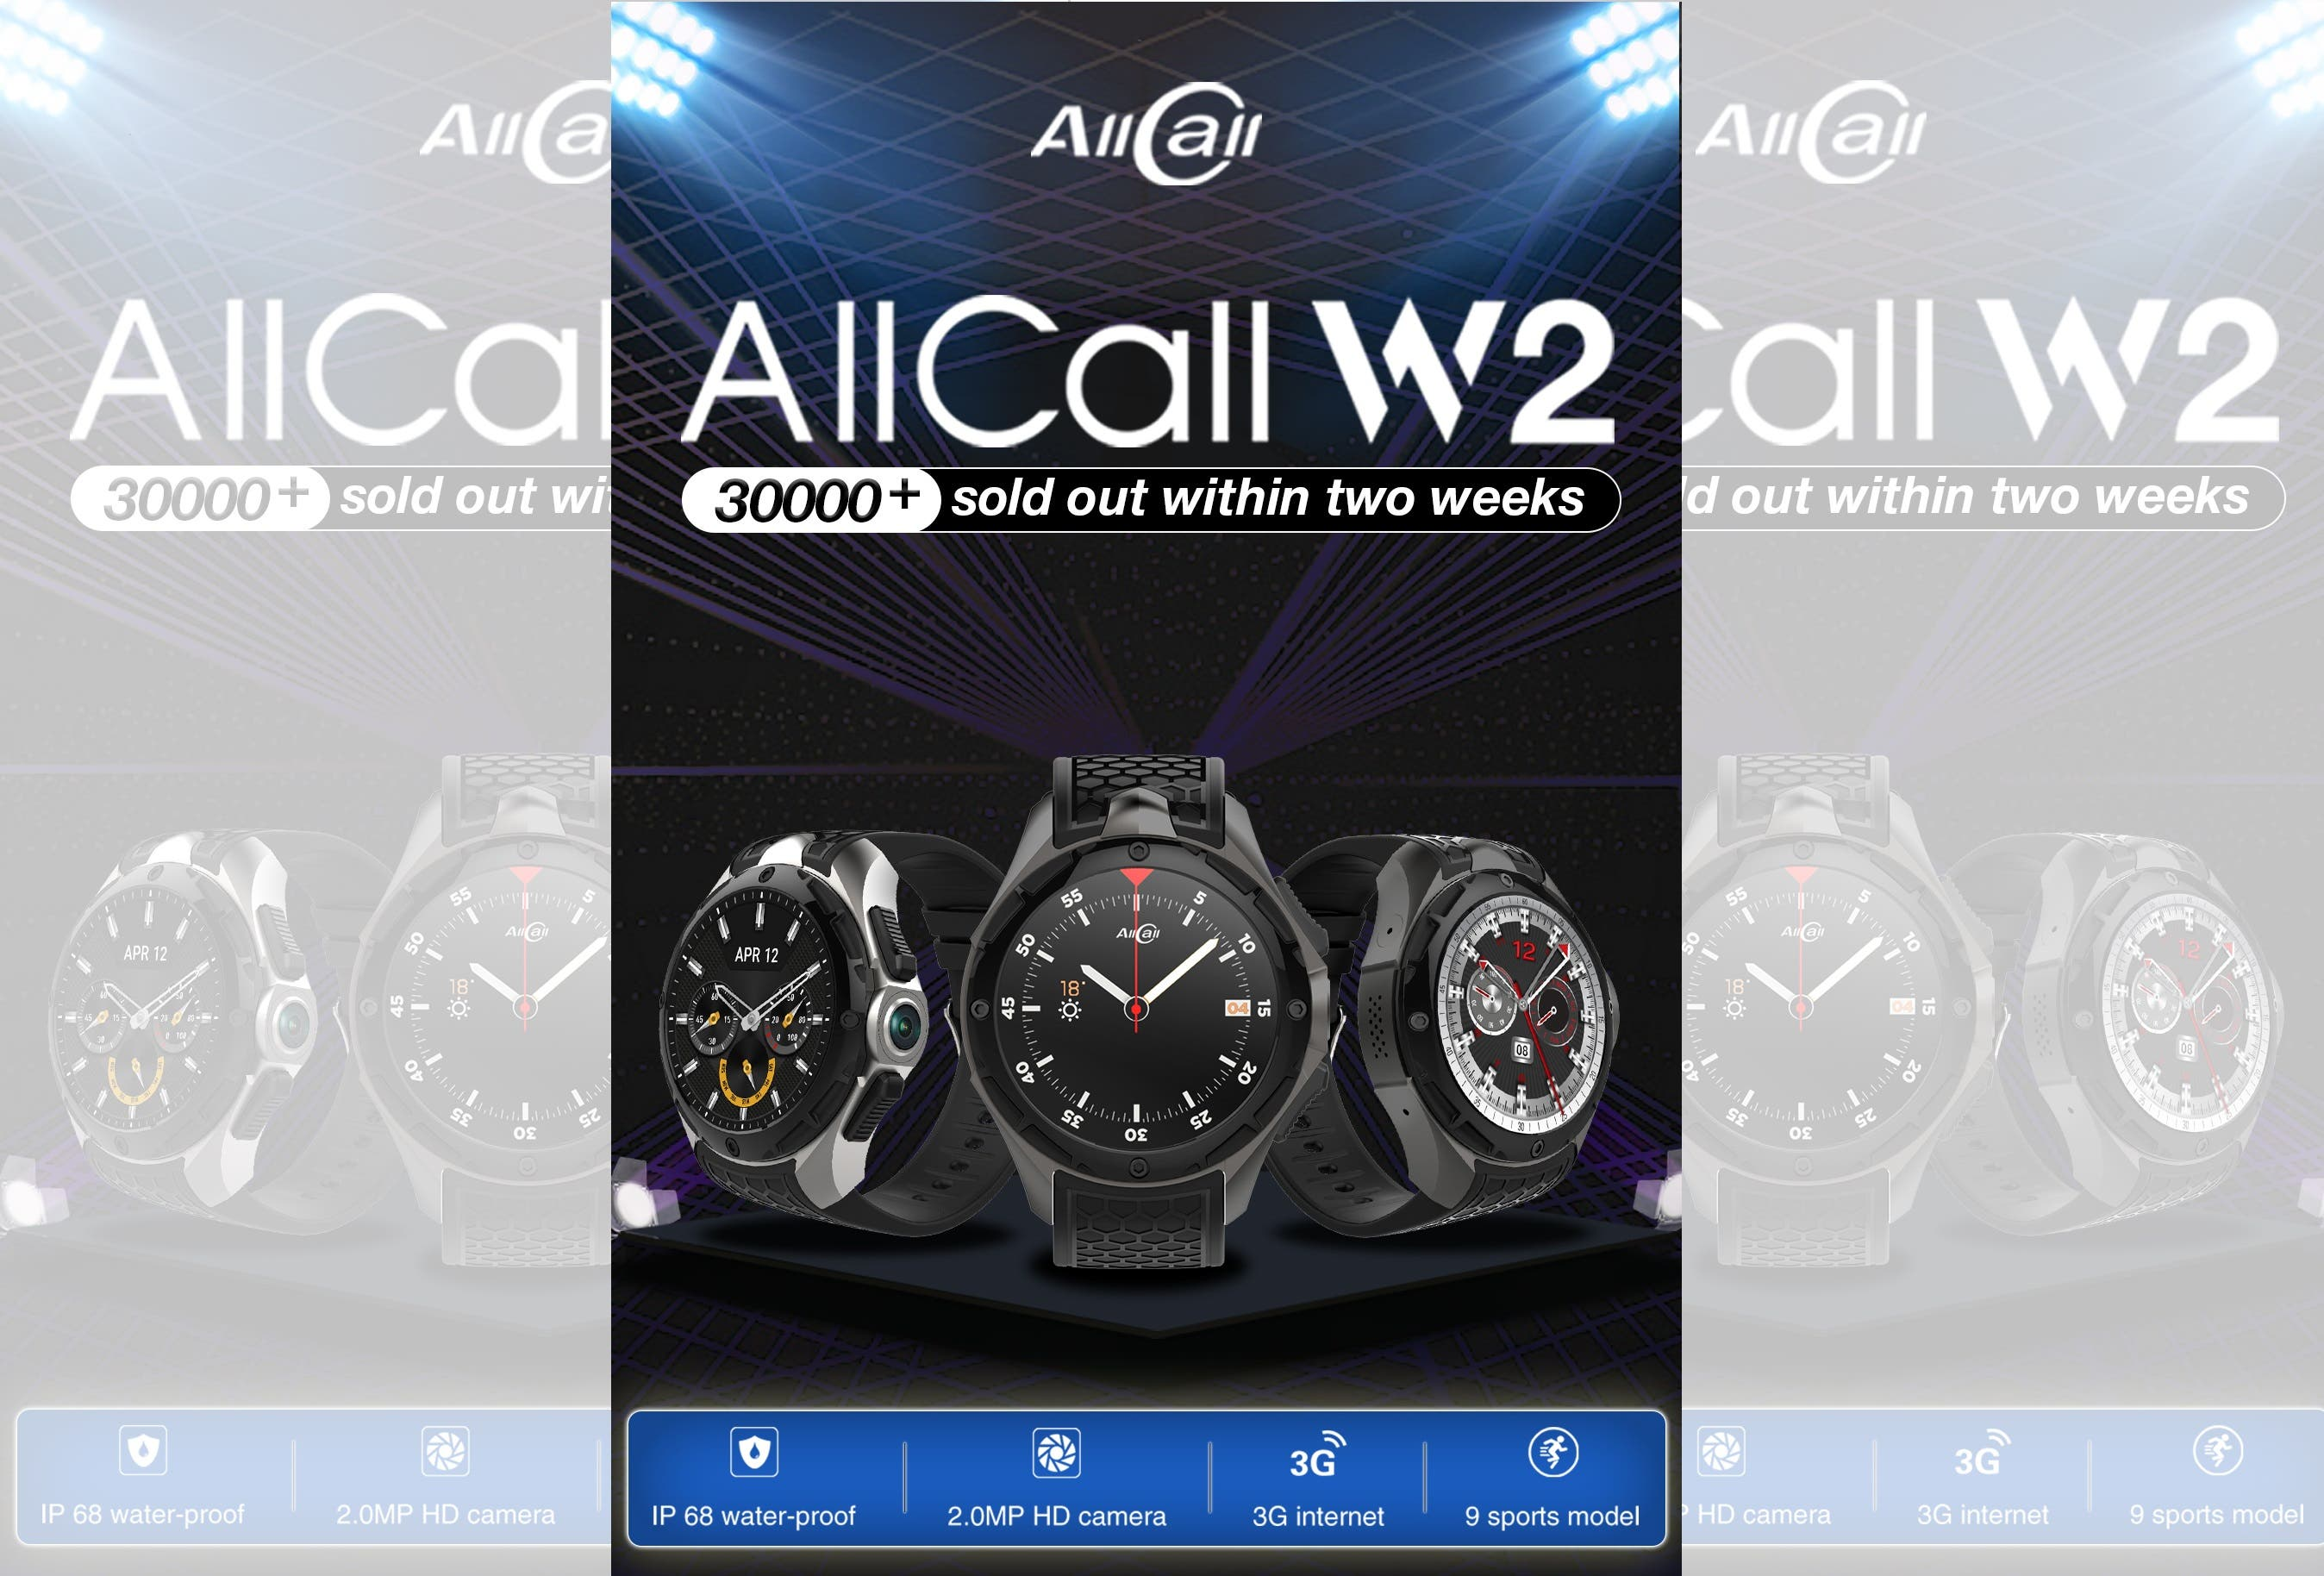 AlLCall W2